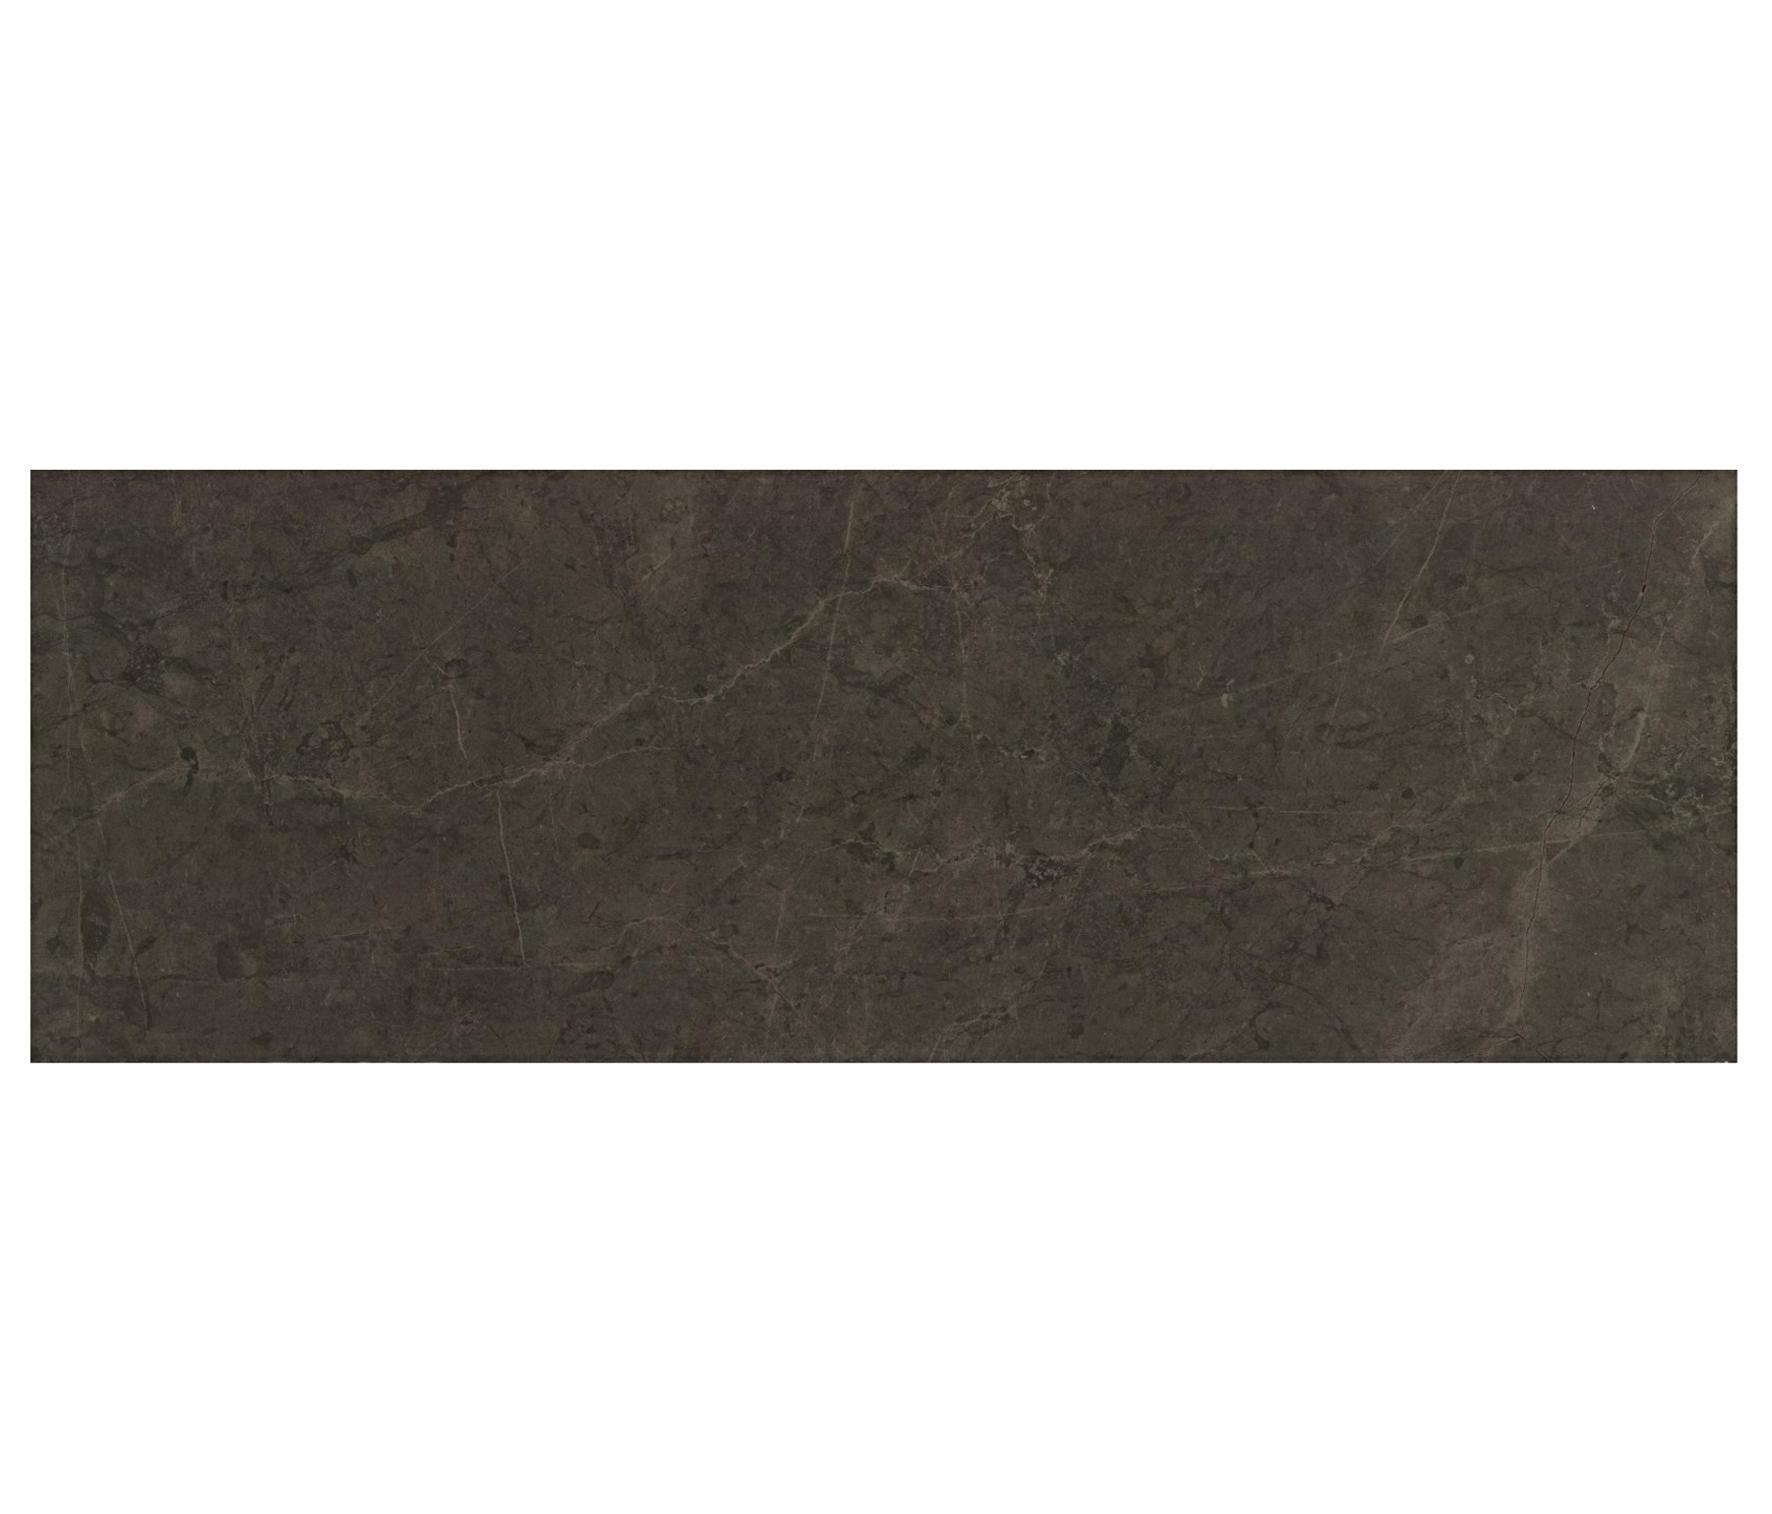 Stonevision carrelage pour sol de marazzi group architonic for Carrelage marazzi prix